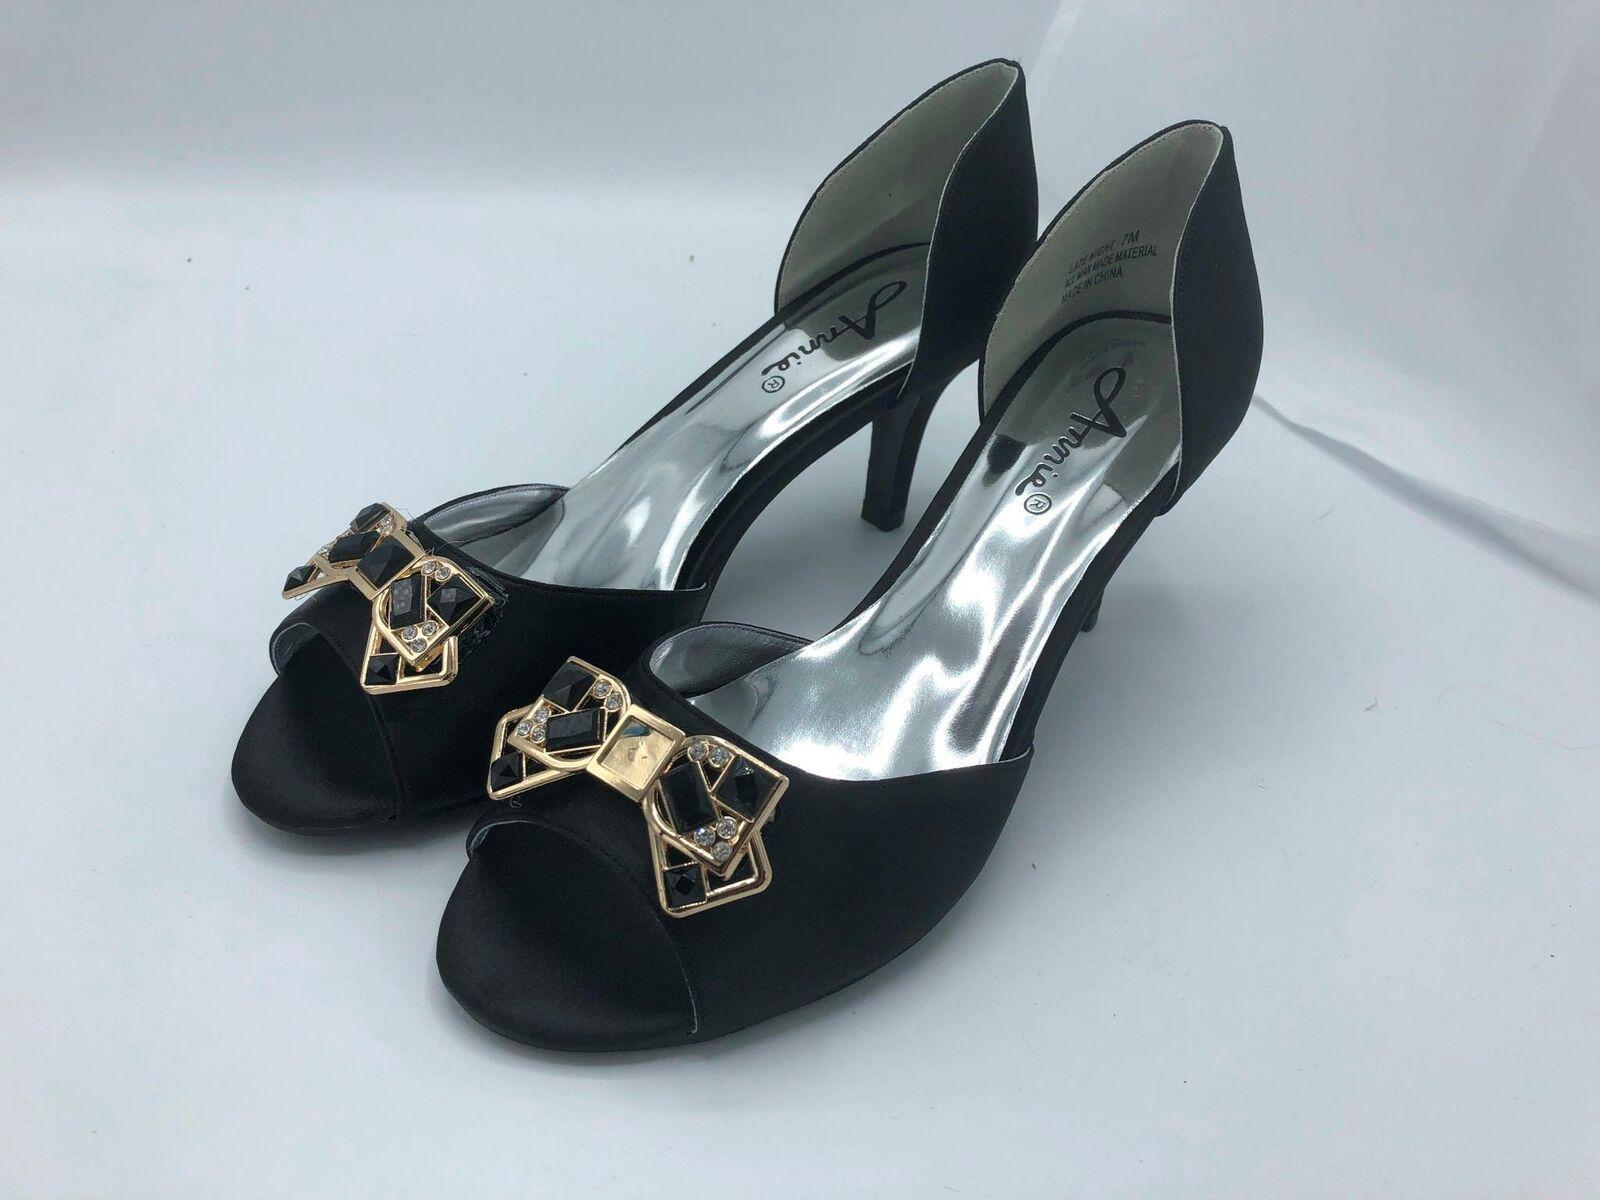 Annie Shoes Late Night Peep-Toe Pumps (1963) Black Satin Size 7M